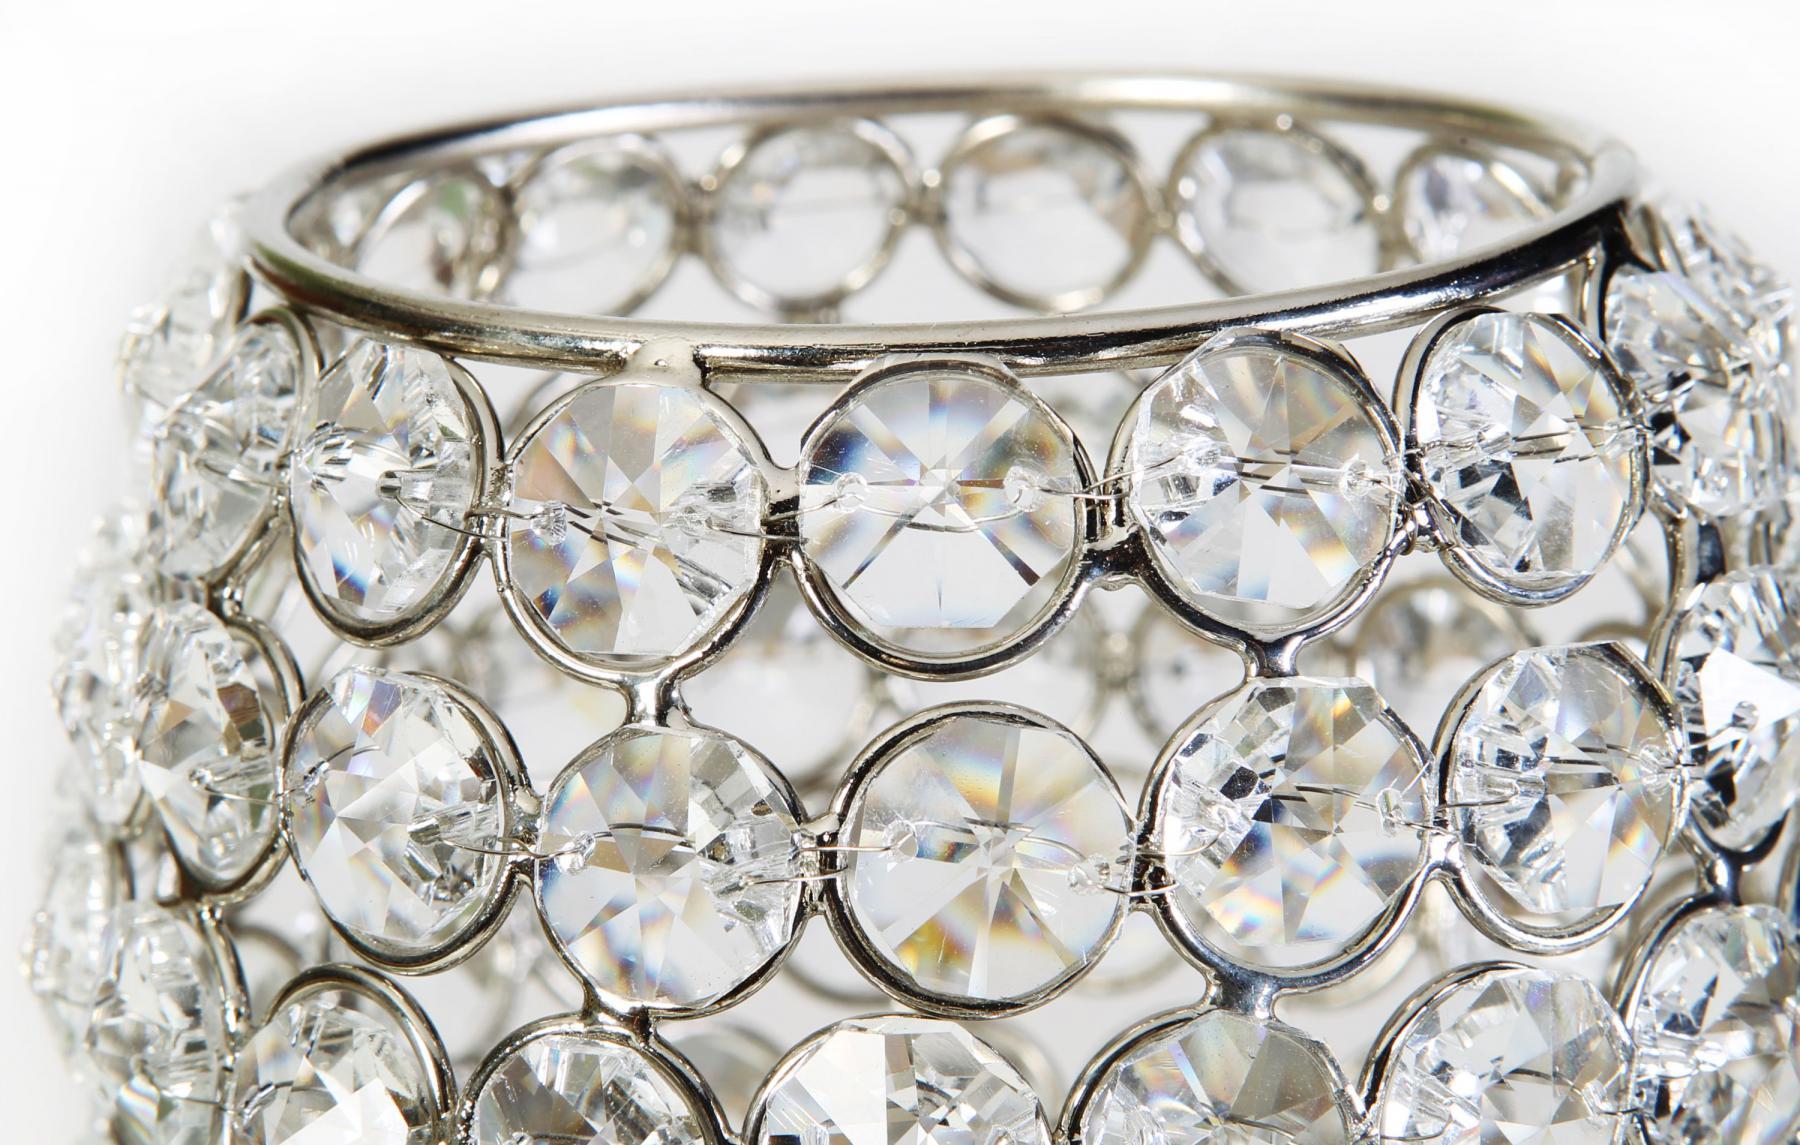 Kristall Deko kristall kerzenständer teelichthalter noelle teelichthalter